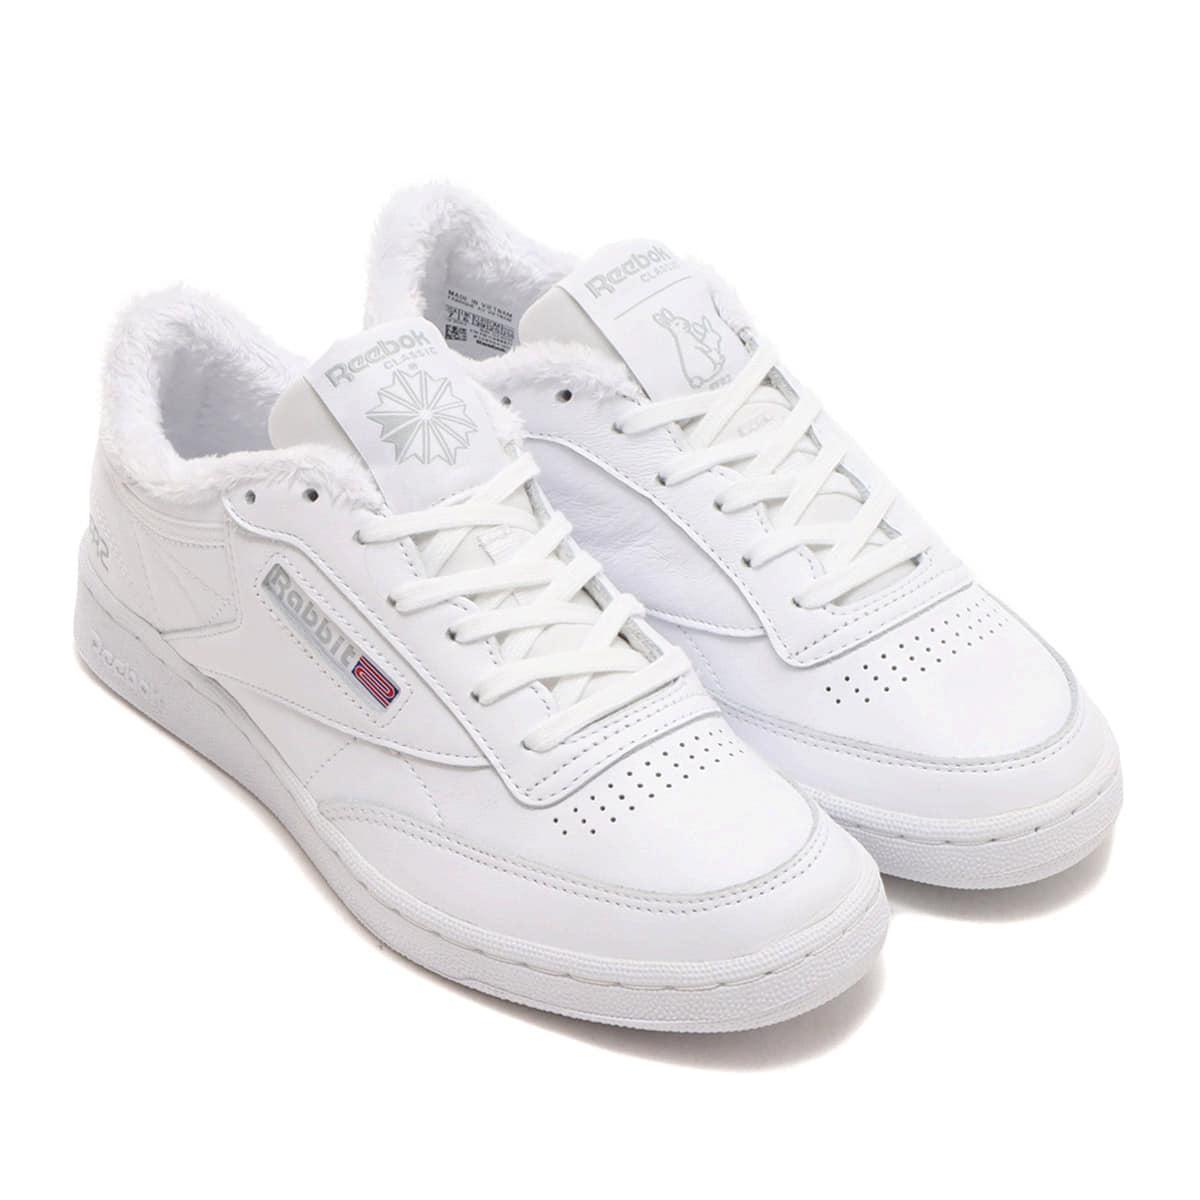 Reebok atmos FR2 CLUB C 85 FR2 FOOTWEAR WHITE/FOOTWEAR WHITE/PURE GRAY 21FW-I_photo_large